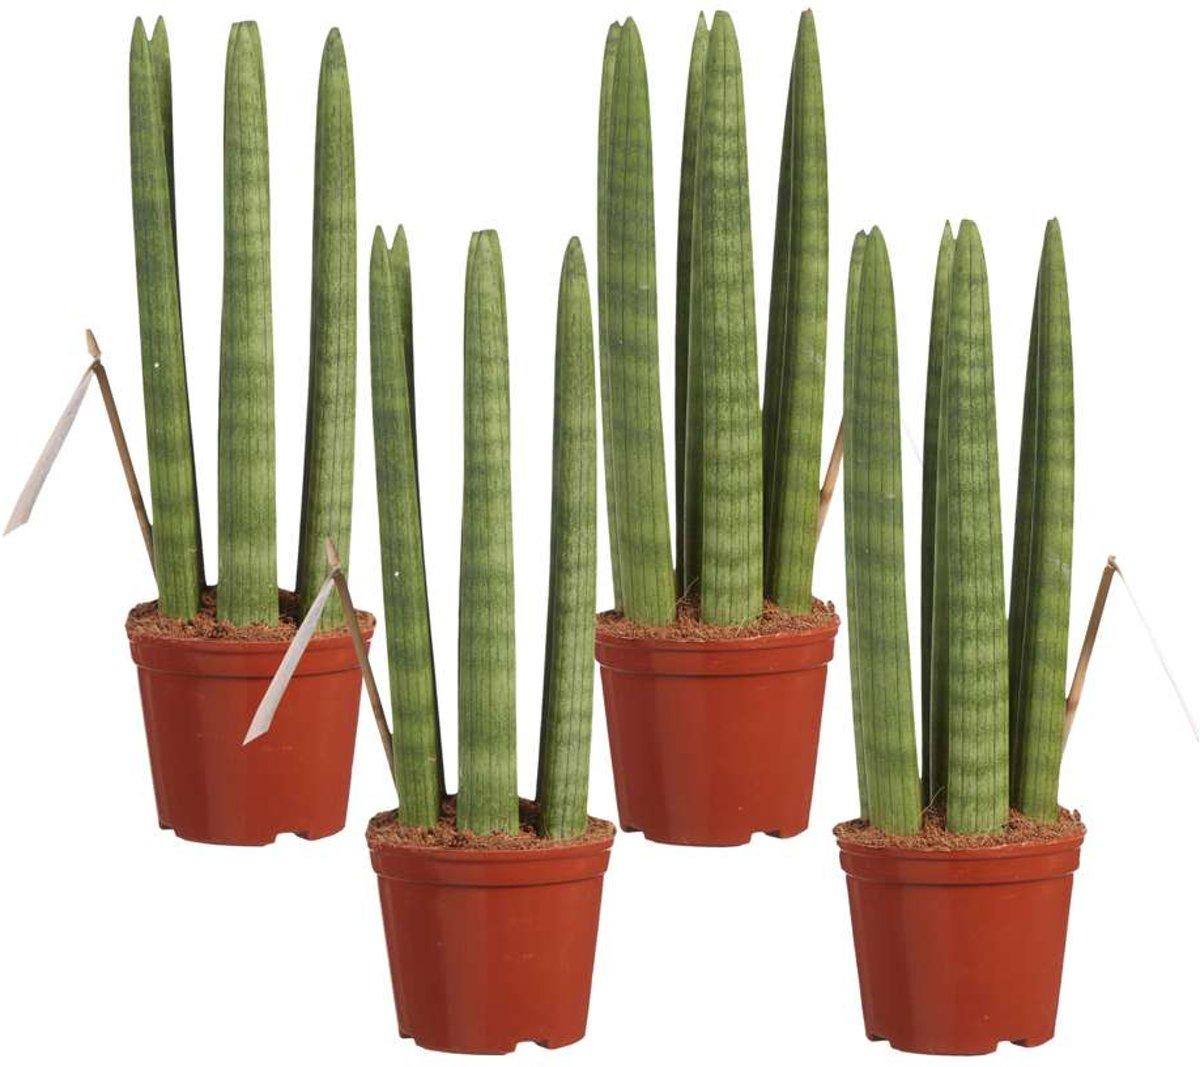 Choice of Green - 4 Sanseveria Straight oftewel Vrouwentong - Kamerplant in Kwekerspot ?10 cm - Hoogte ?30 cm kopen